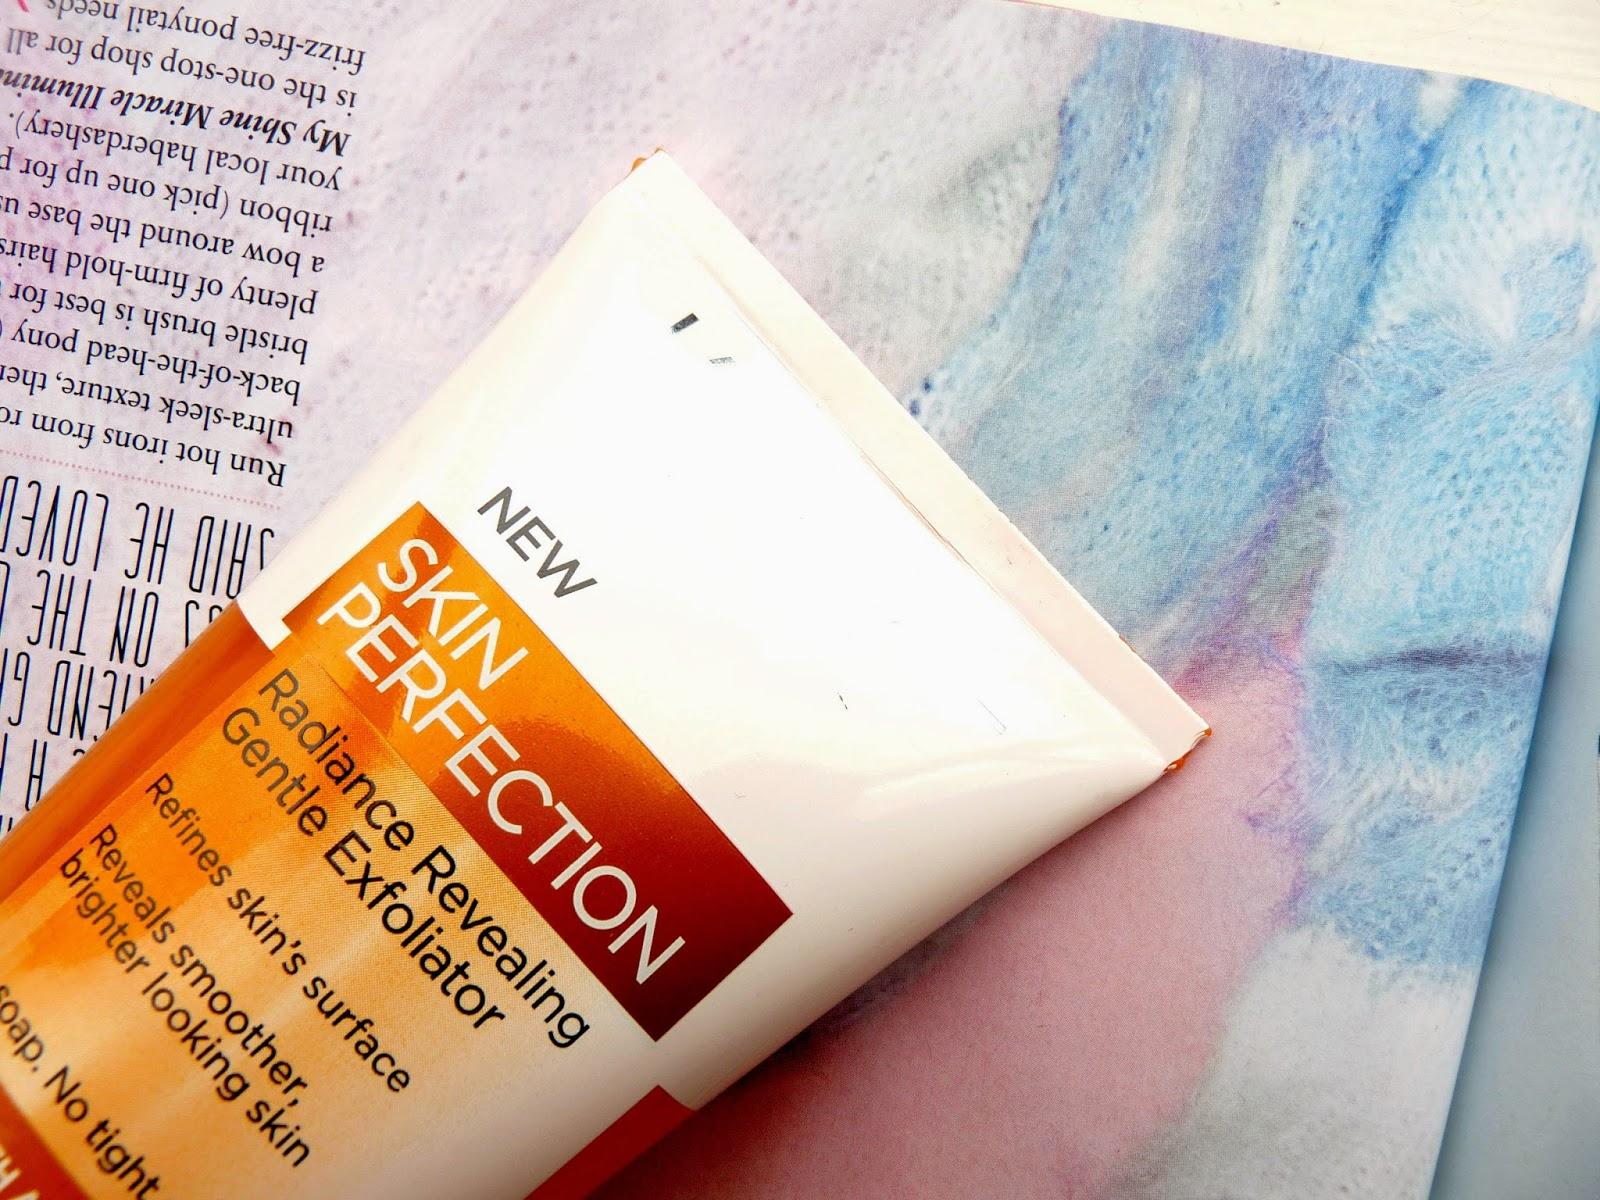 L'Oreal Skin Perfection Exfoliator